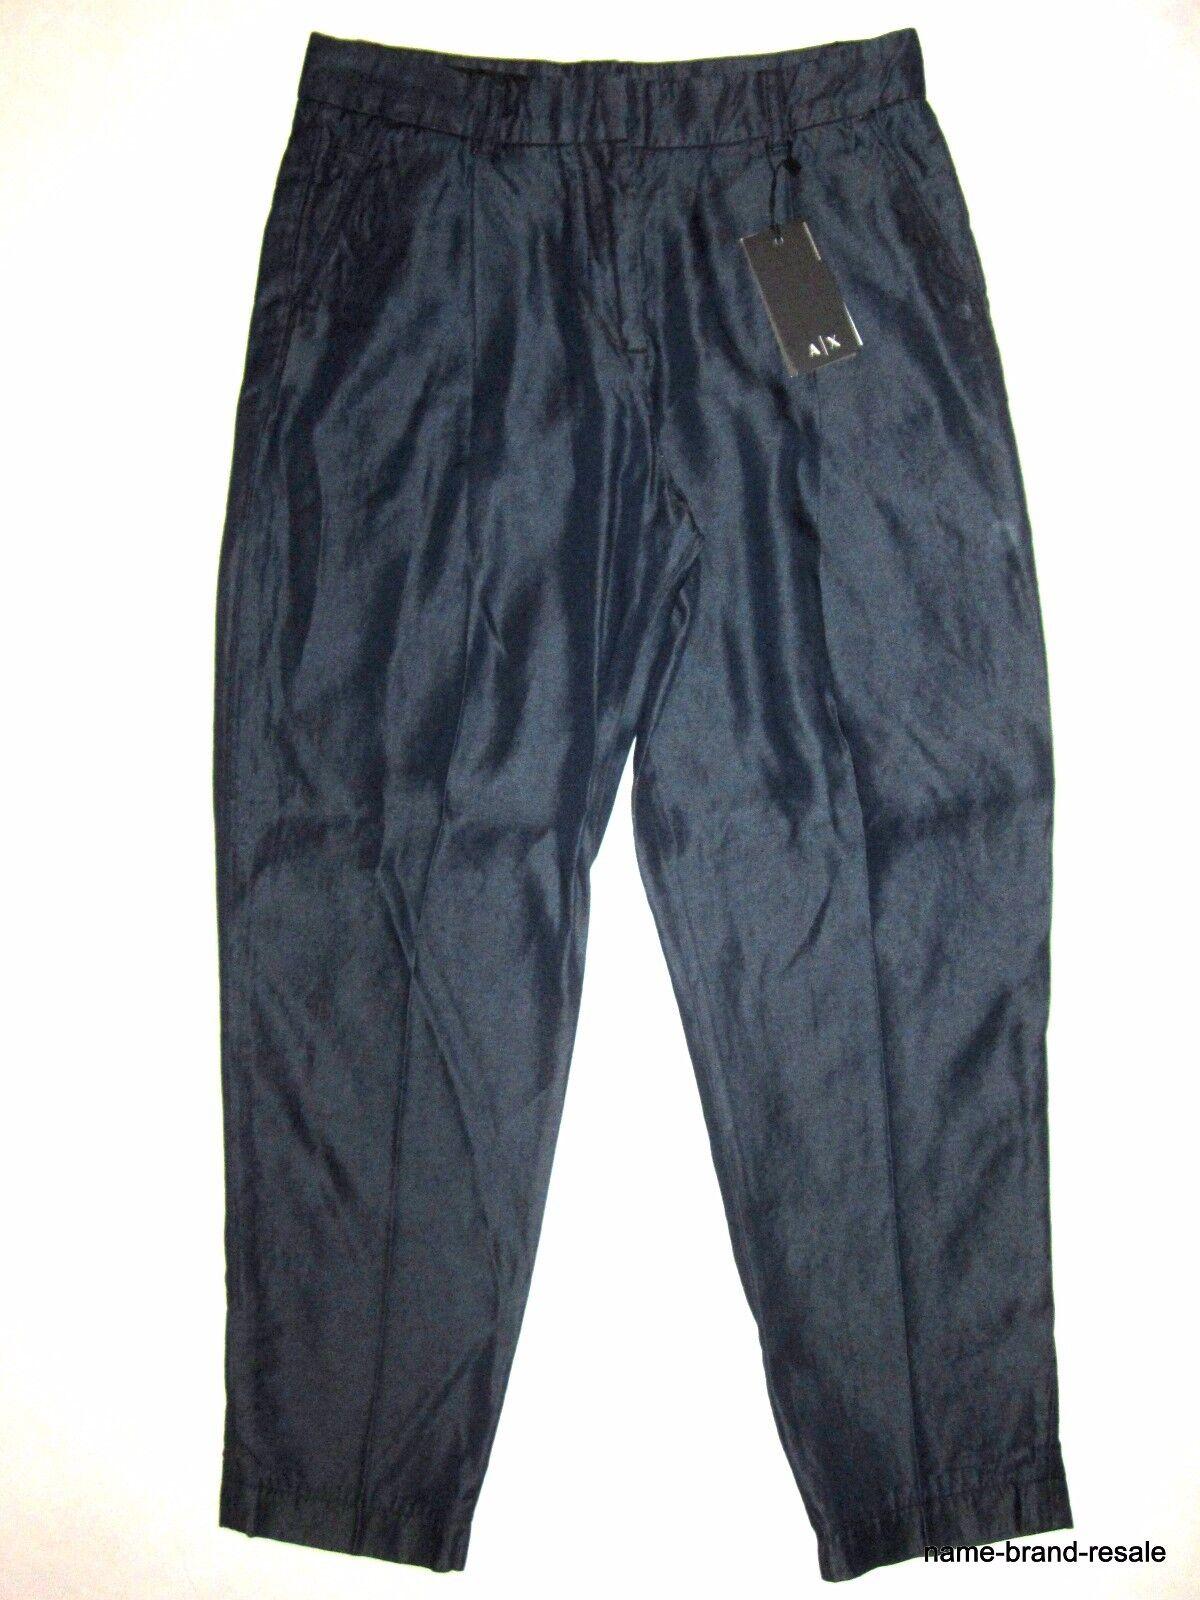 ARMANI EXCHANGE  130 NWT 100% Tencel JEANS Womens 6 Dark Denim Trouser Pants NEW